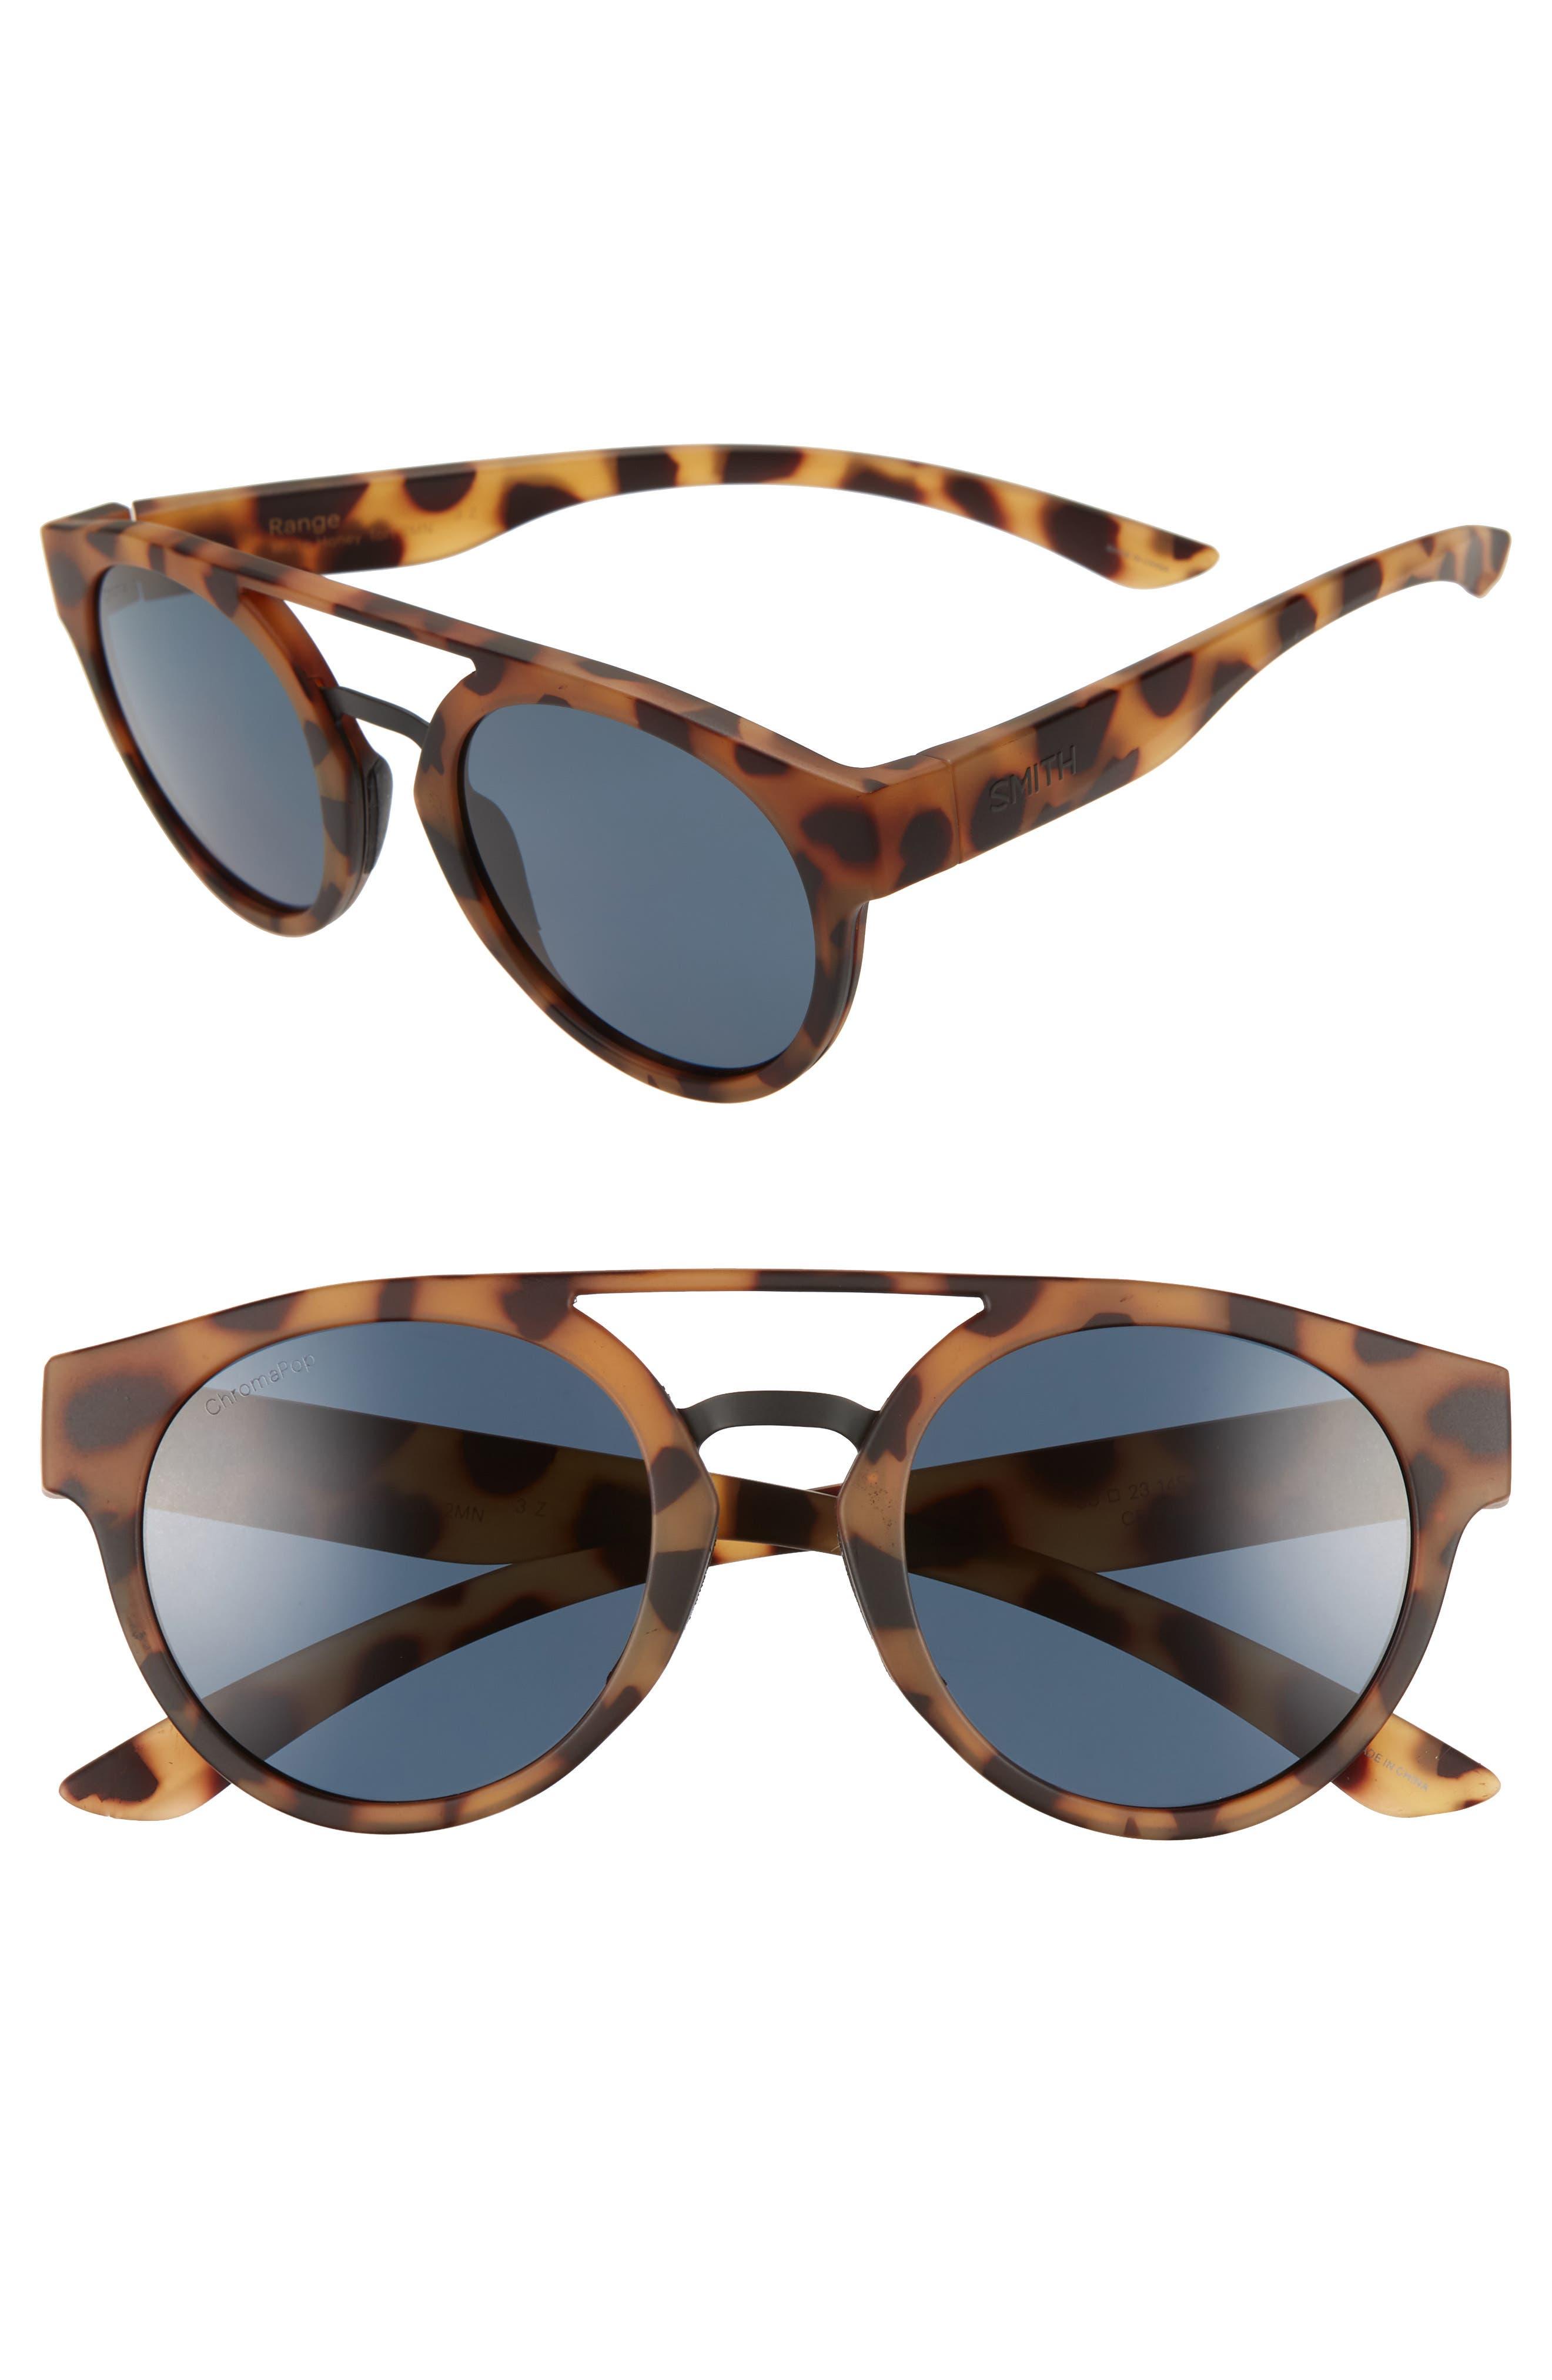 Range 50mm ChromaPop<sup>™</sup> Polarized Sunglasses,                             Main thumbnail 1, color,                             MATTE HONEY TORTOISE/ BLACK